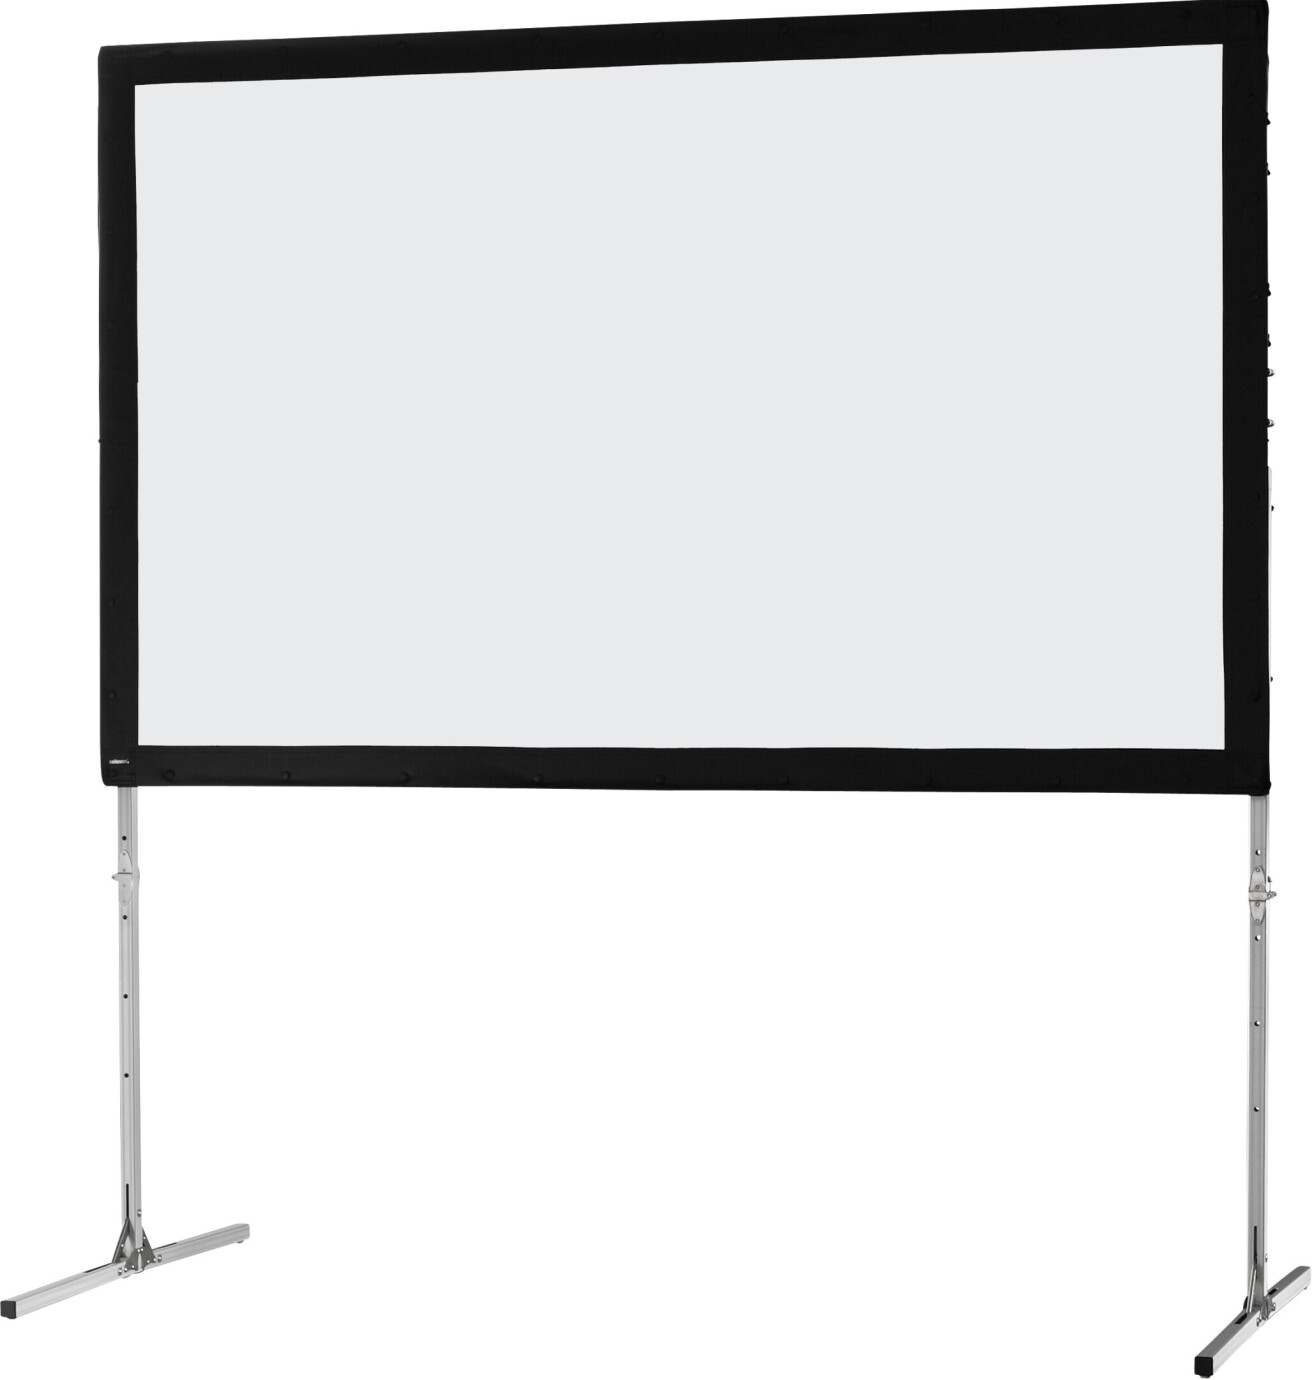 celexon Faltrahmen Leinwand Mobil Expert 203 x 127 cm, Frontprojektion